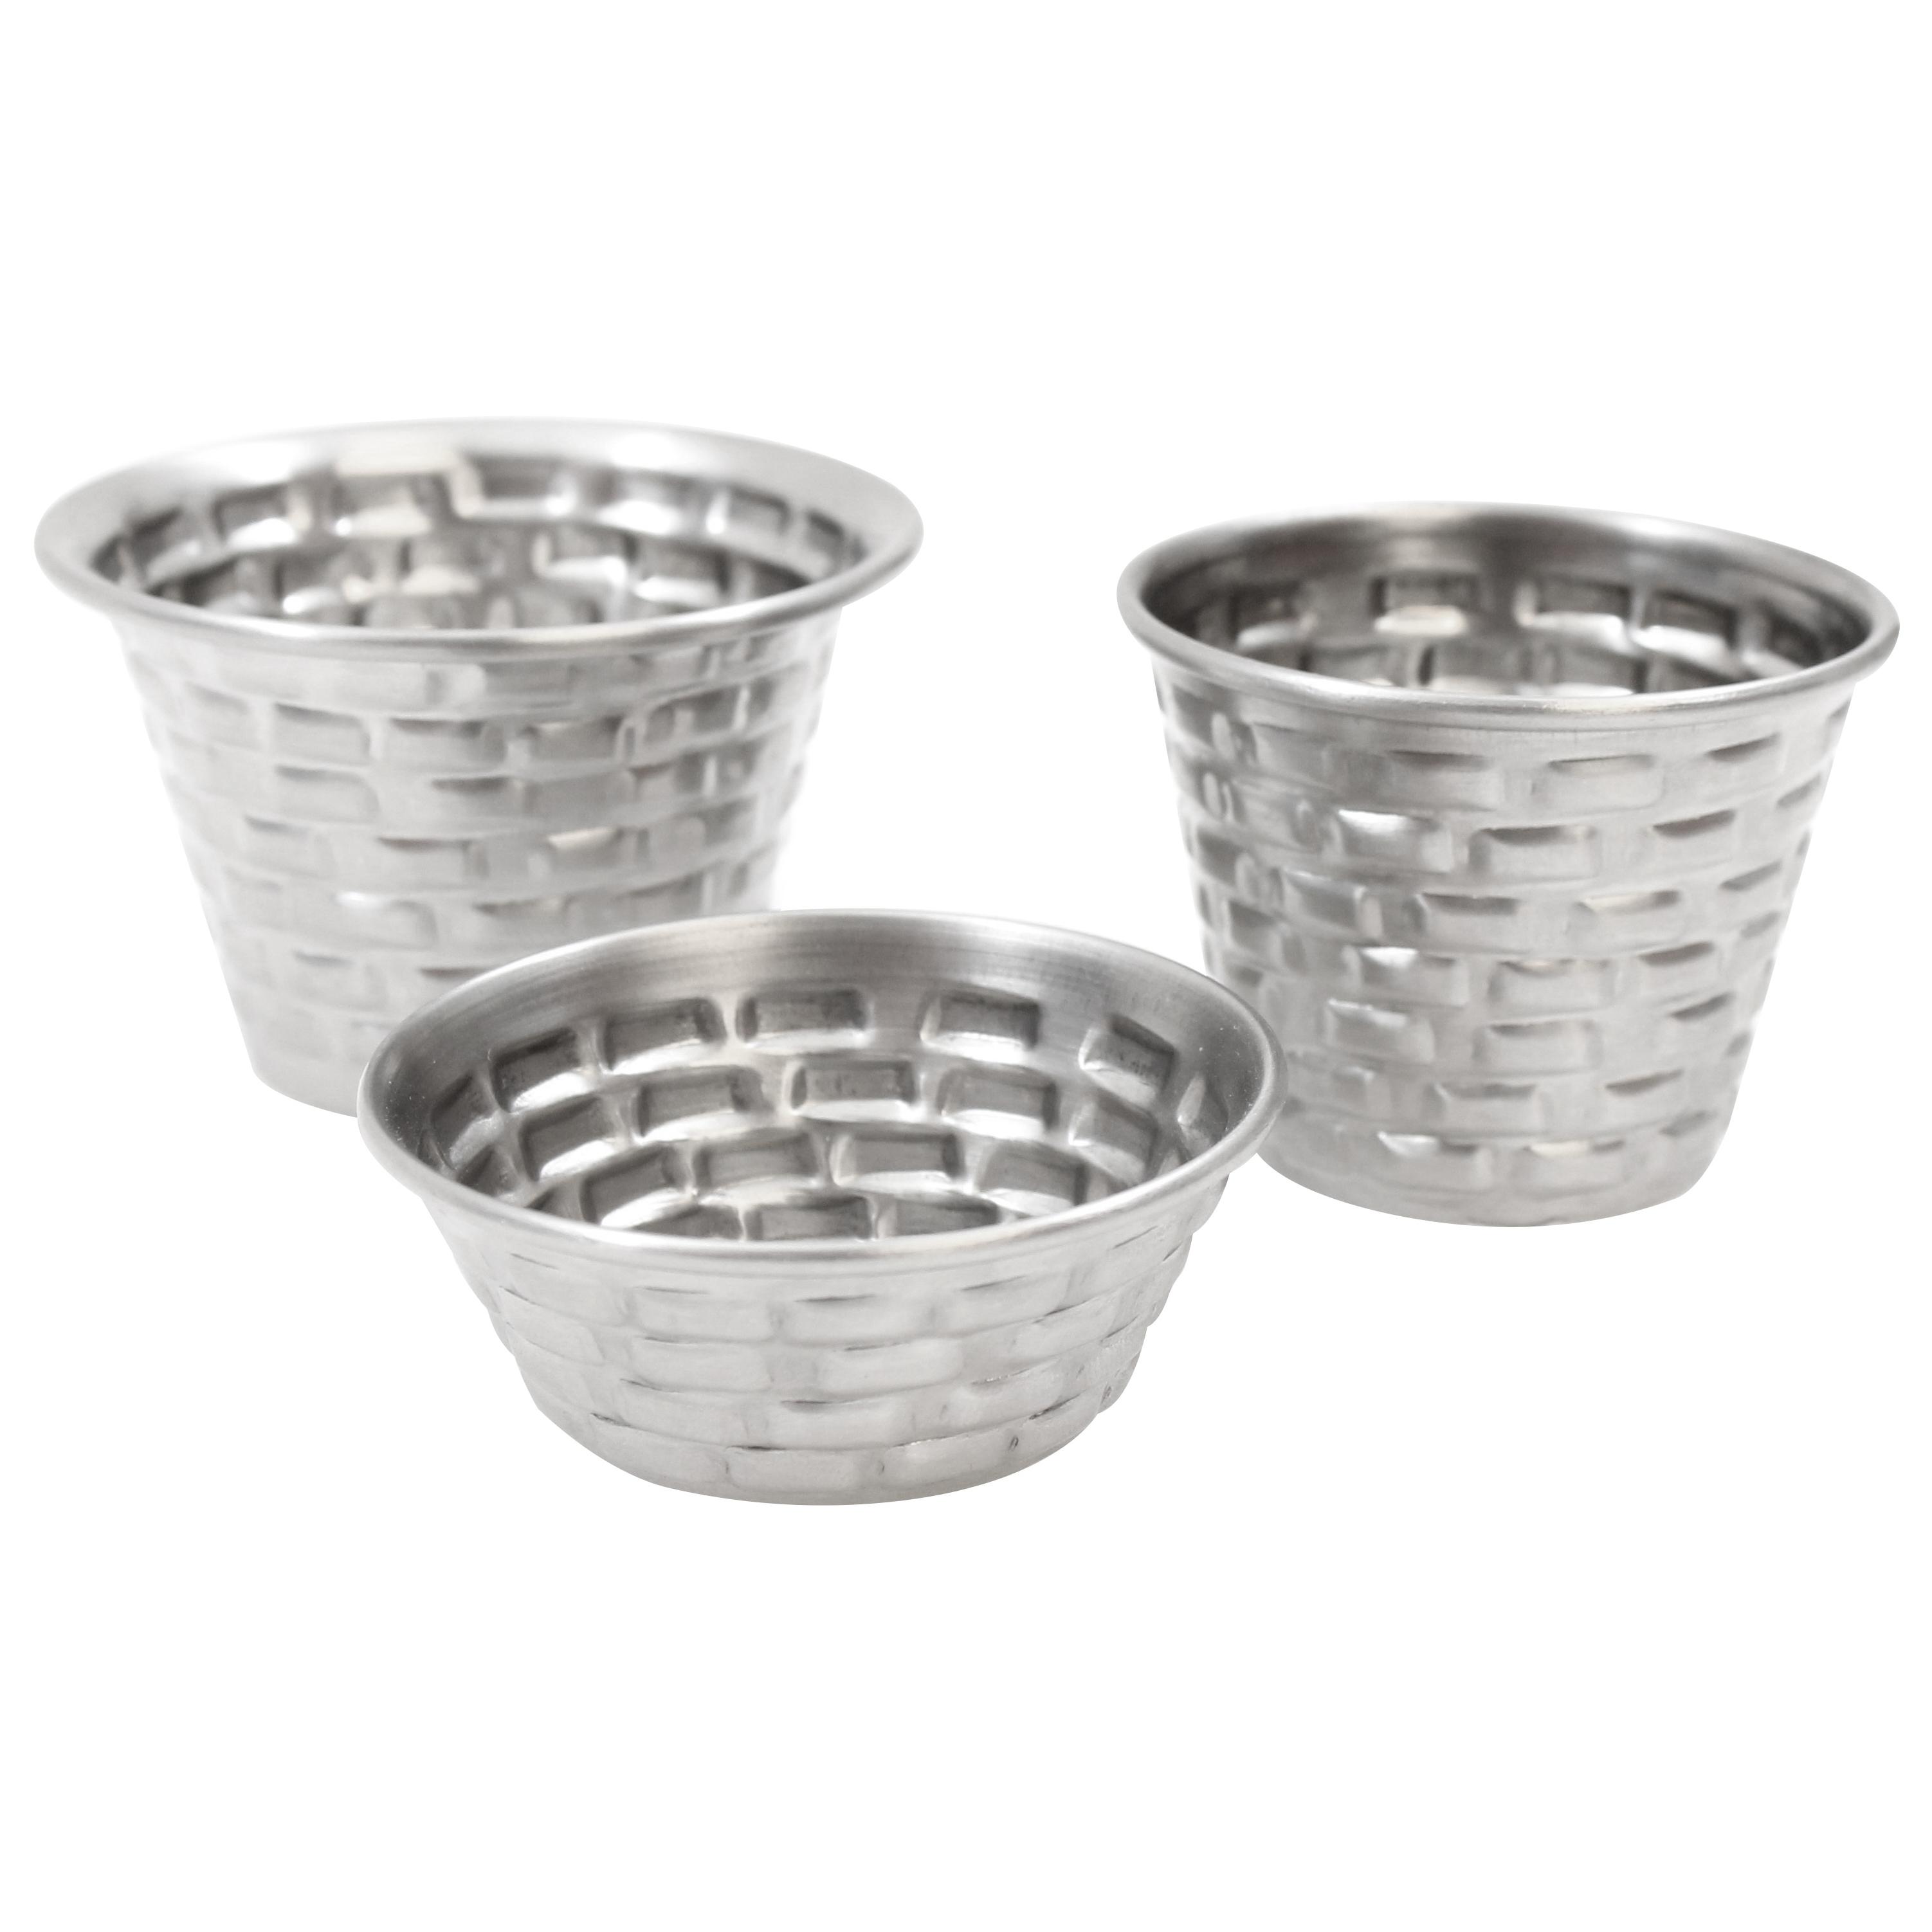 TableCraft Products GRSS1 ramekin / sauce cup, metal